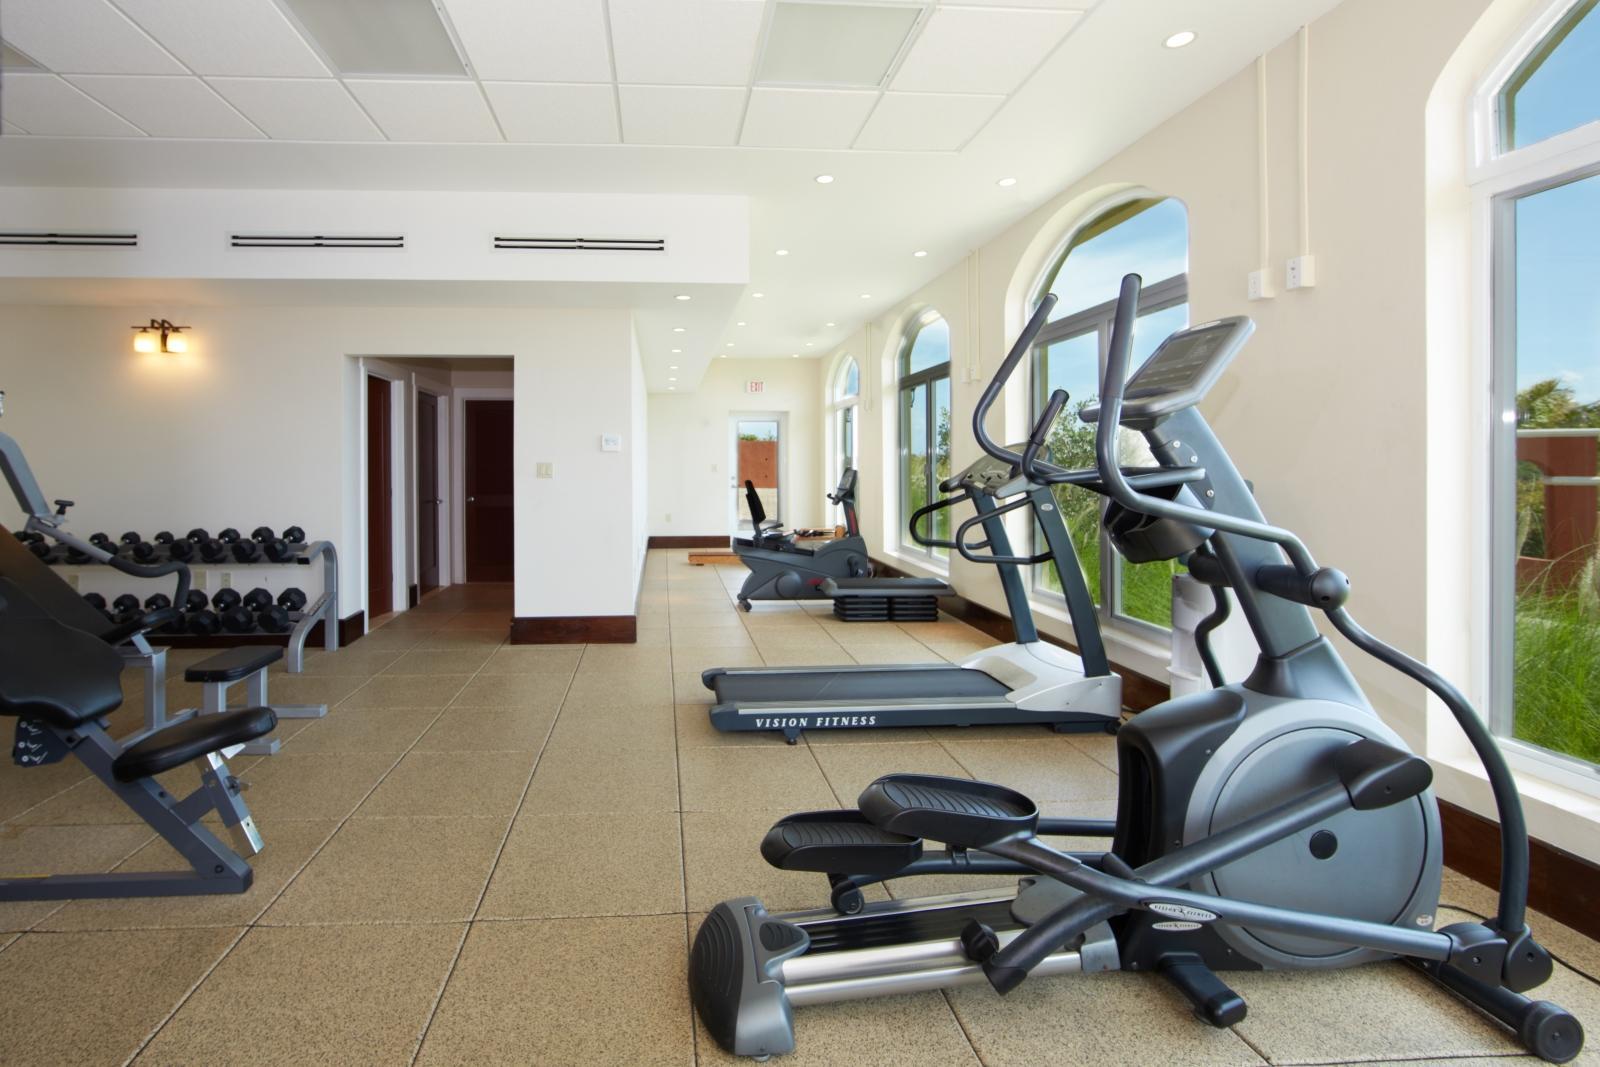 Sirenusa workout center